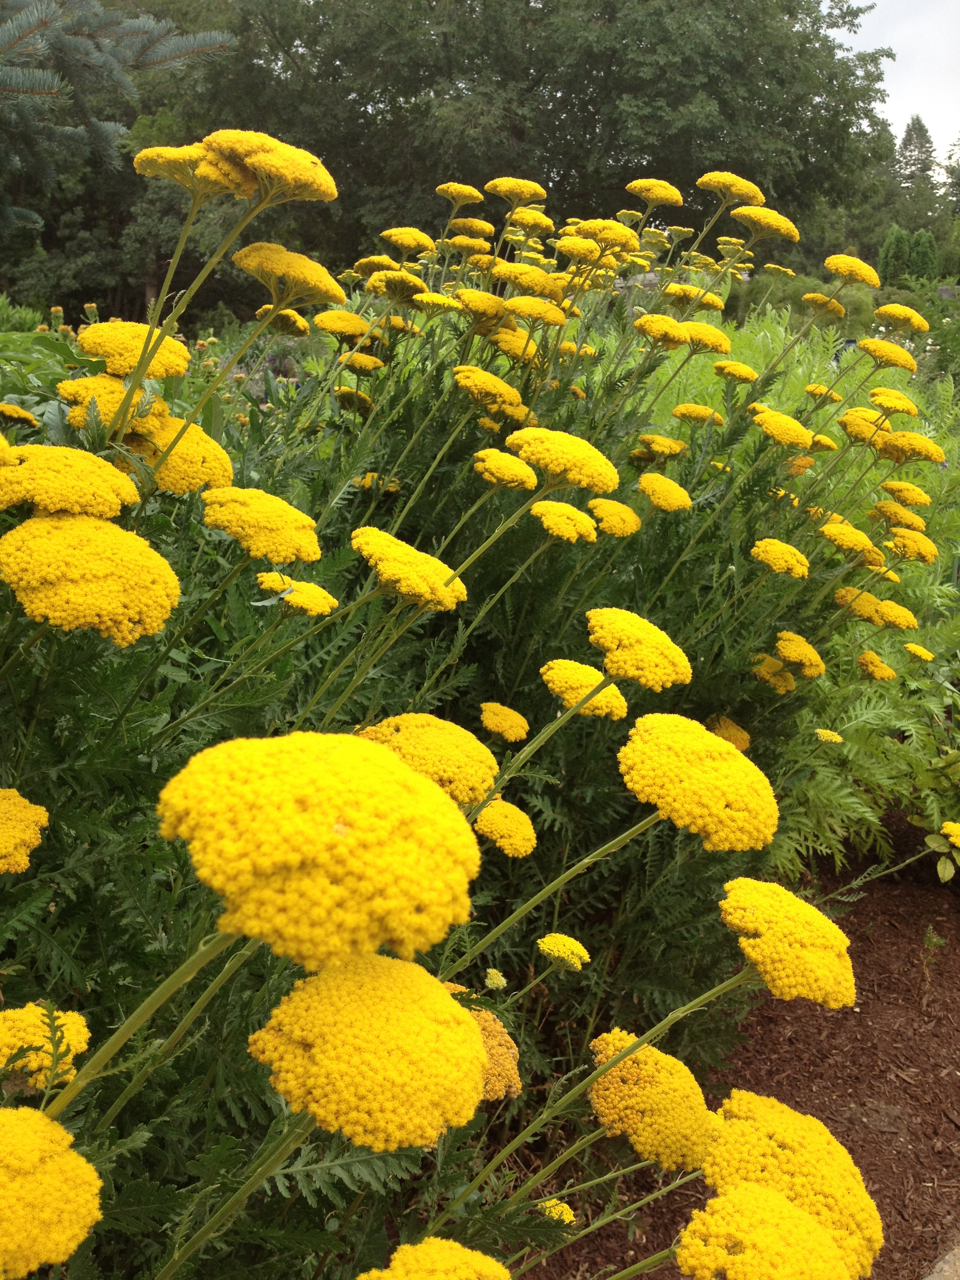 denver botanic garden yellow